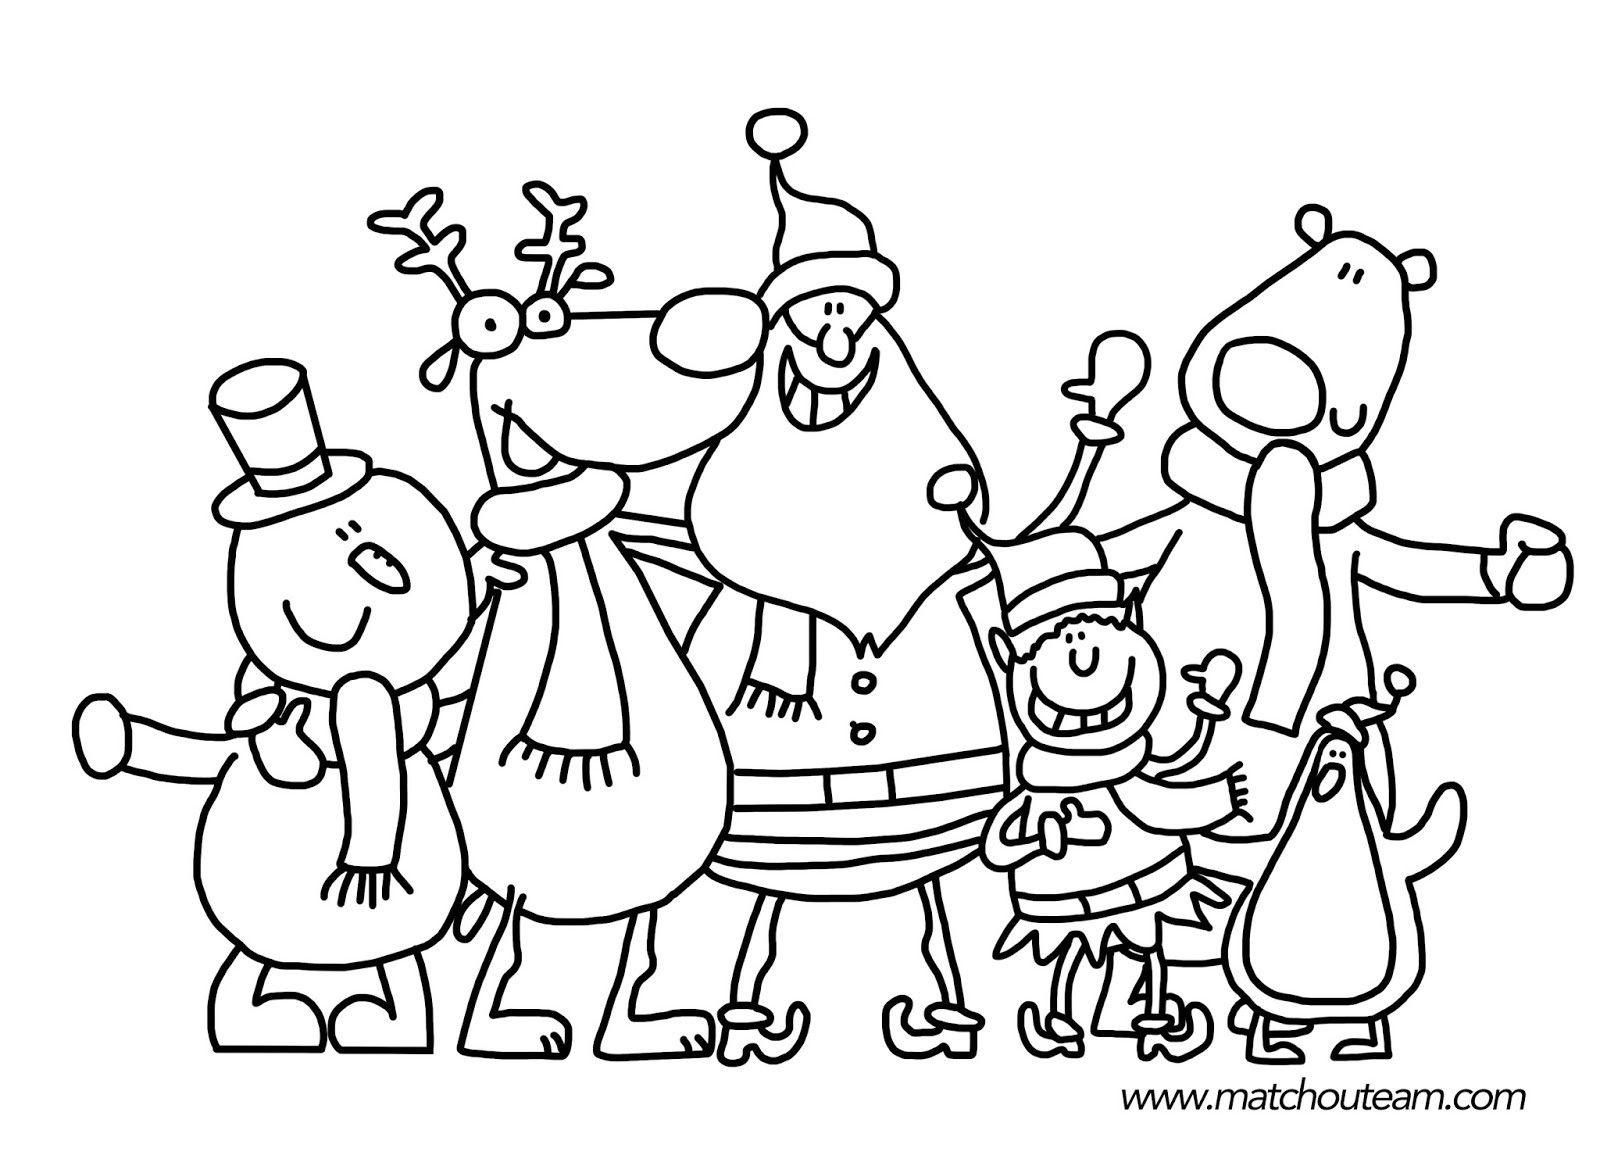 Coloriage Noel En Ligne Fajarindra Meilleur Coloriage Noel En Ligne Fajarindra Tendances 25 Coloriage De N Digital Stamps Coloring Pages Coloring For Kids